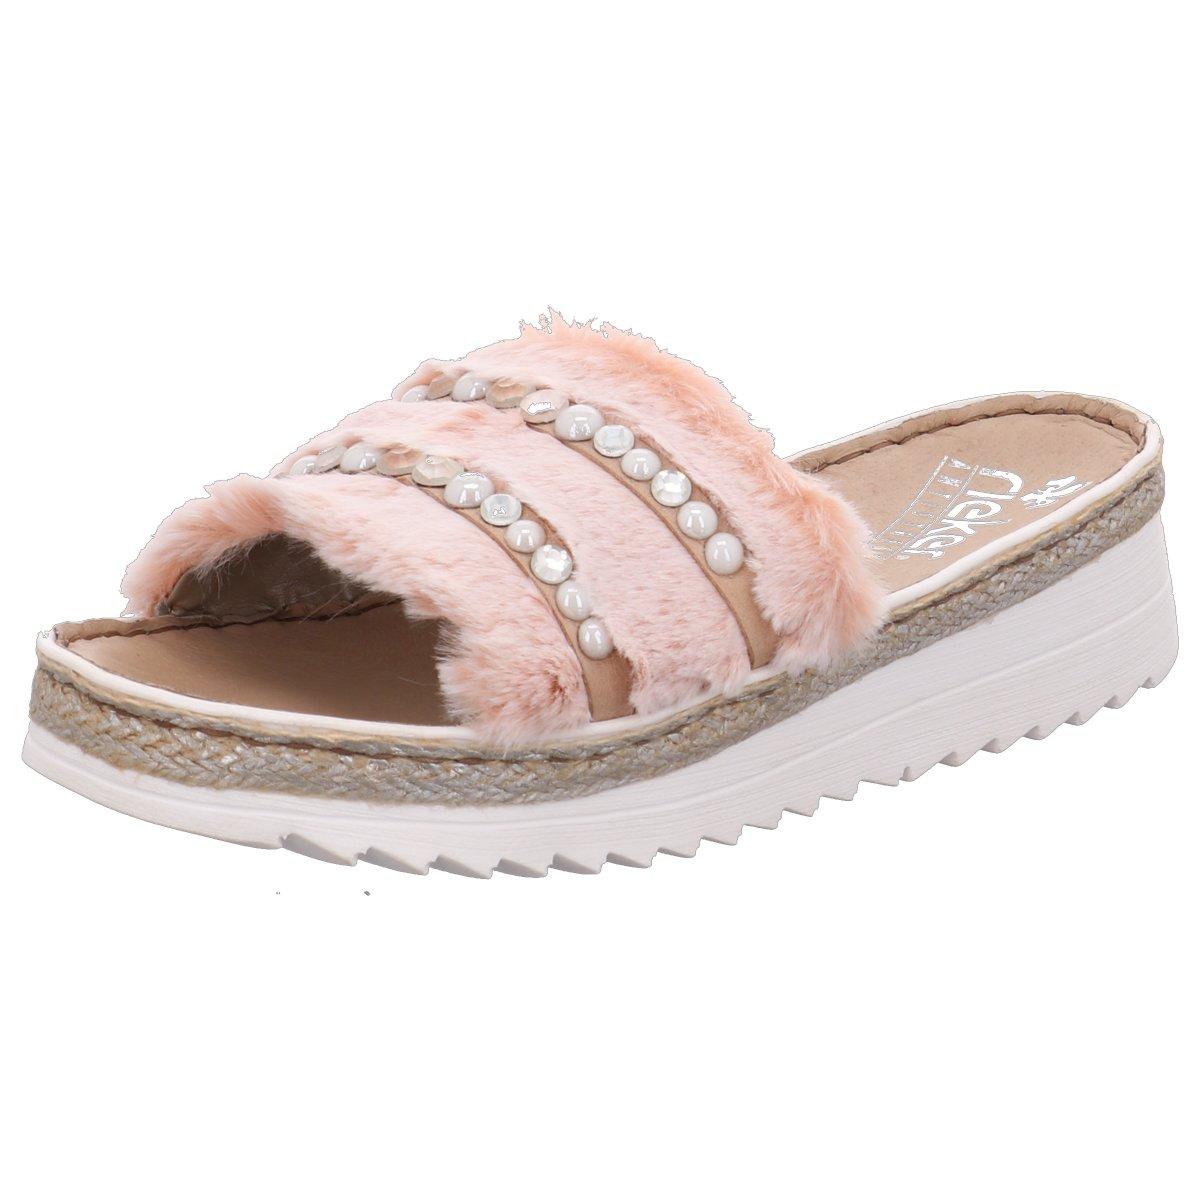 Details zu Rieker Damen Sandalen Pantolette rosa in 2020